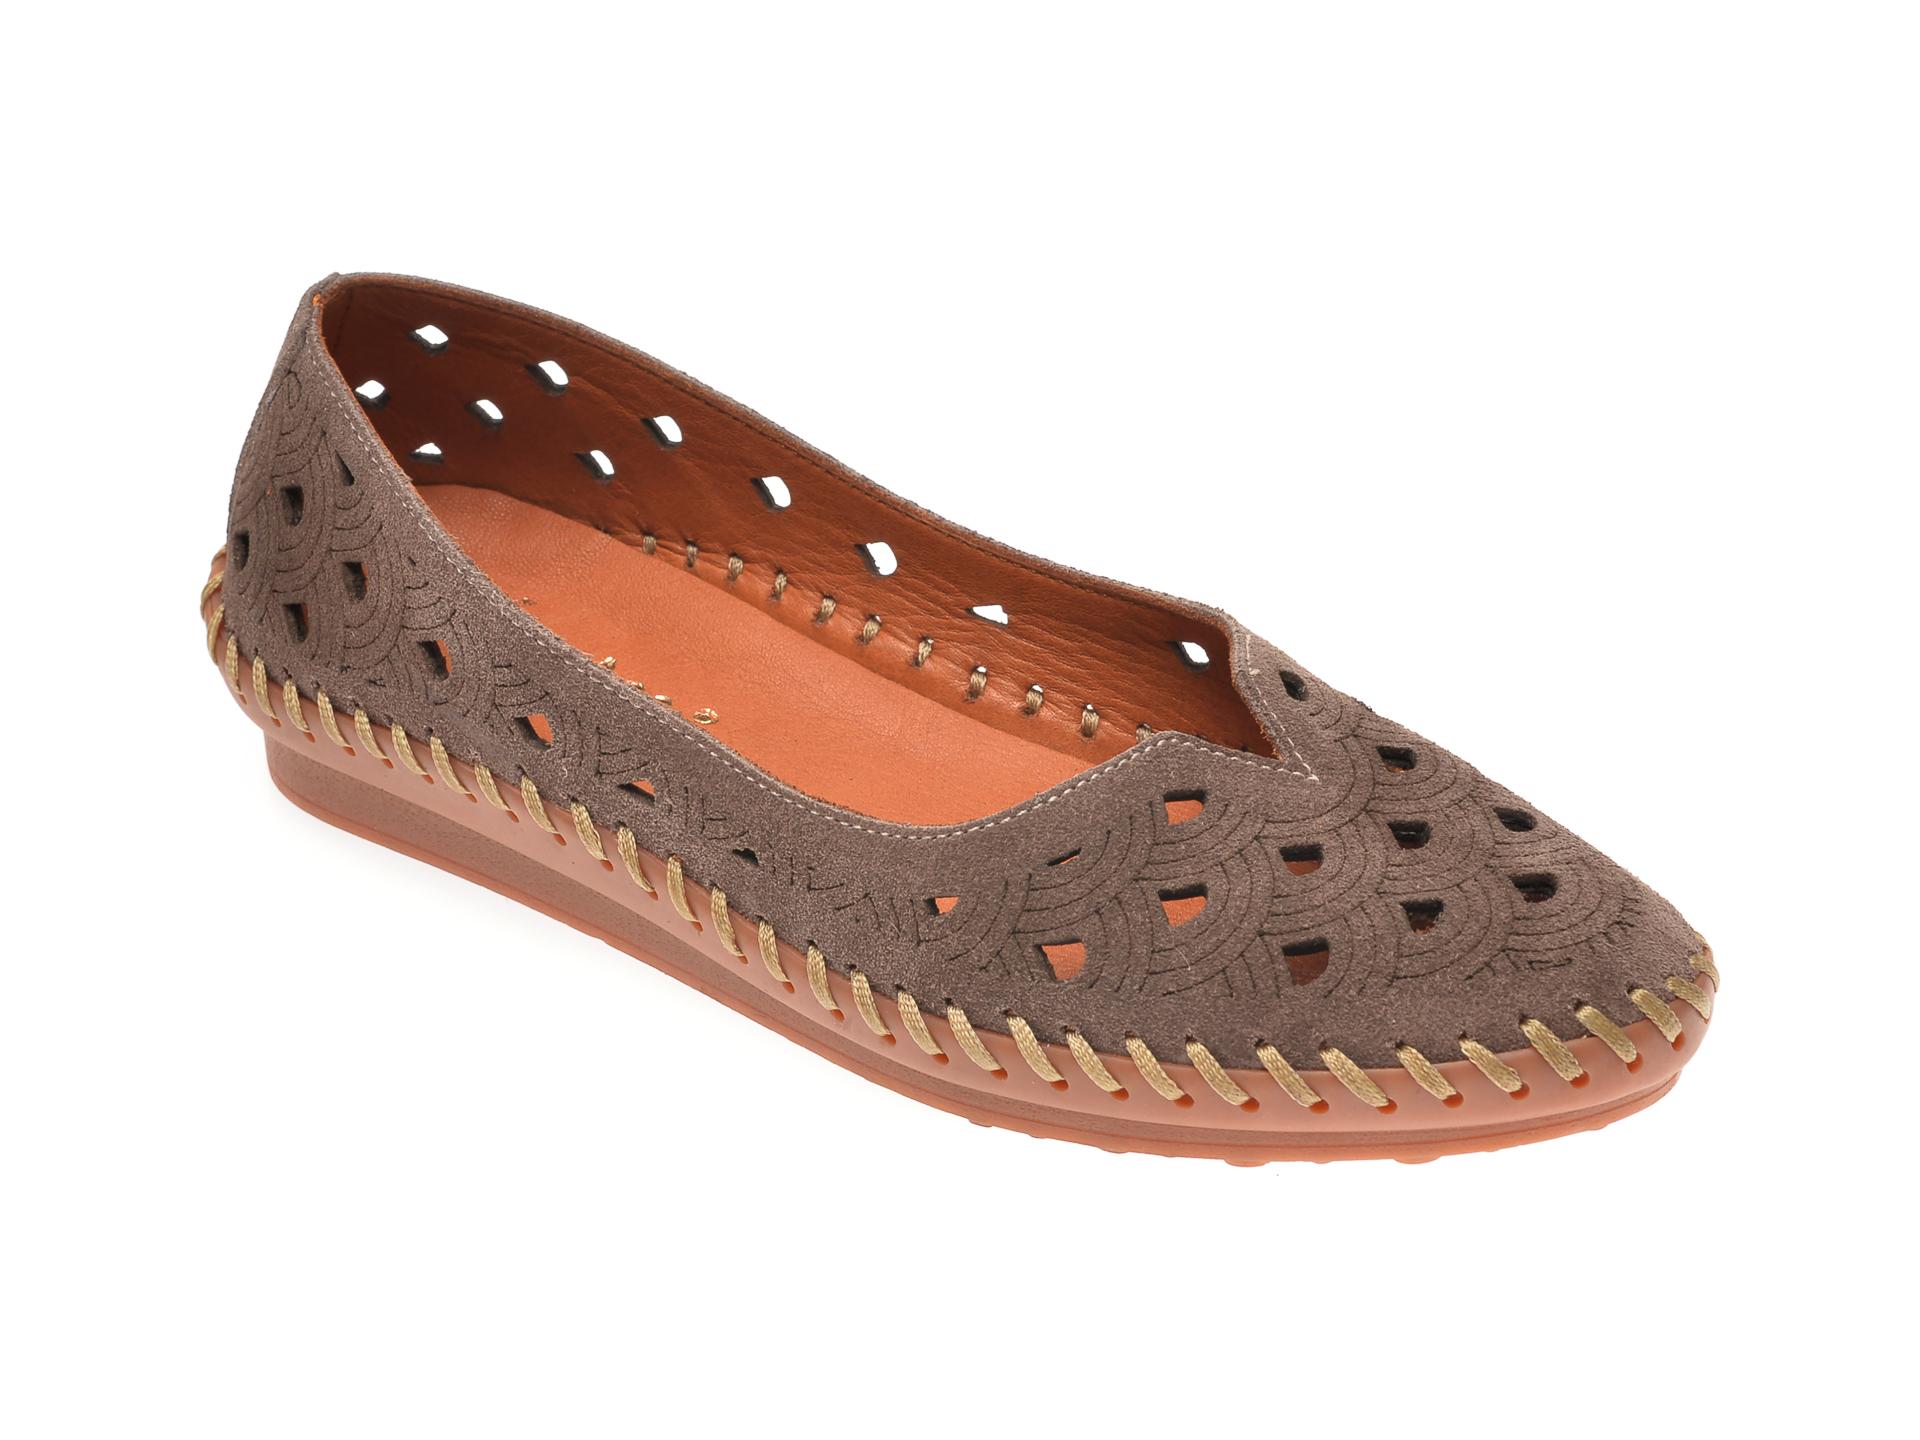 Pantofi PASS COLLECTION maro, 02710, din piele intoarsa